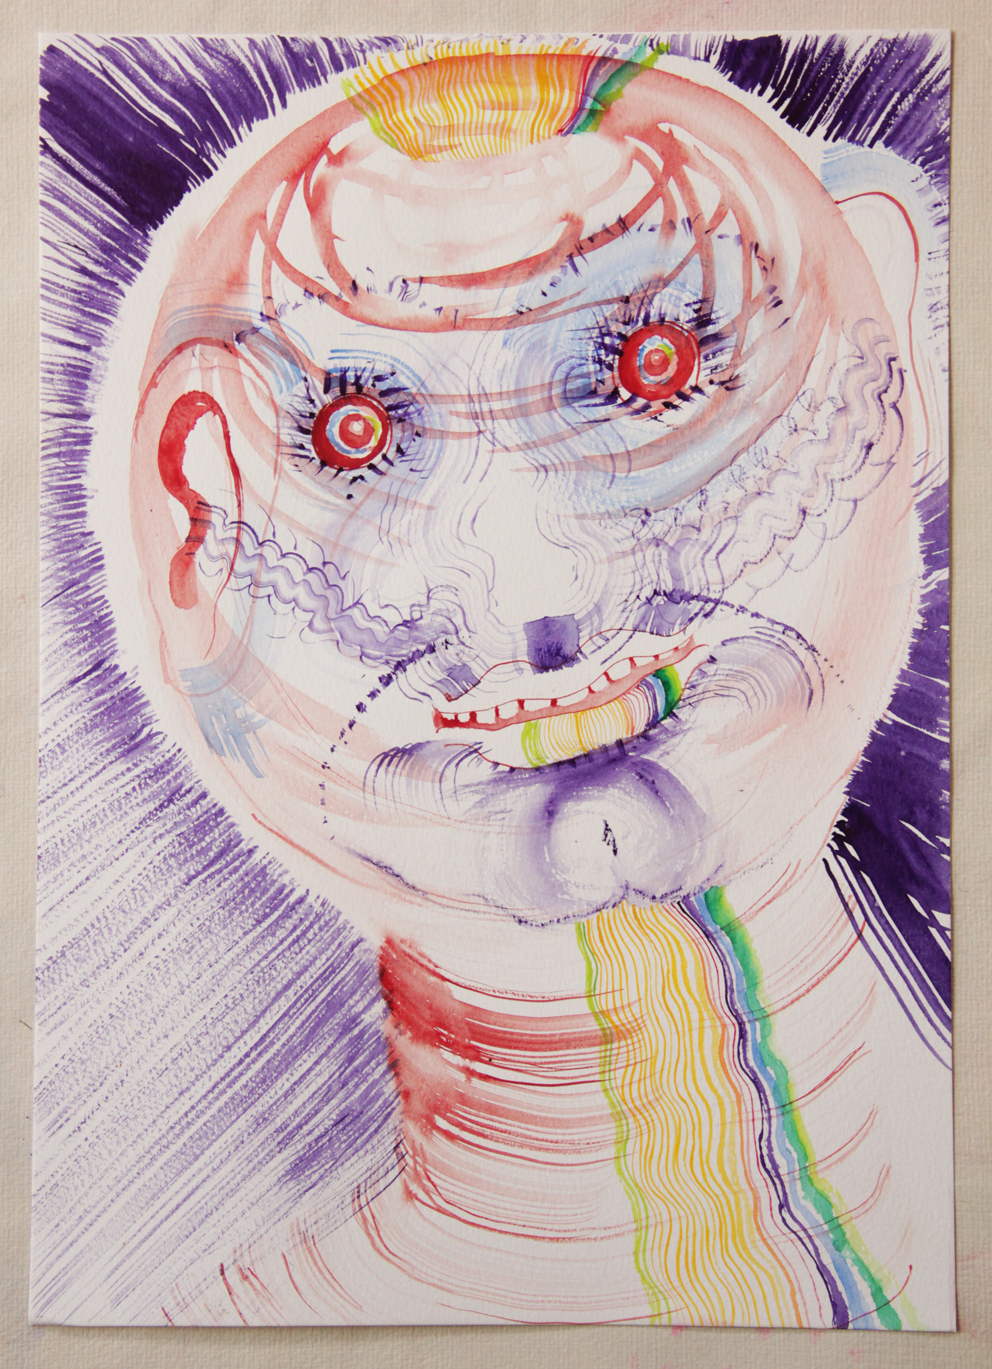 (Česky) Drawings / Kresby